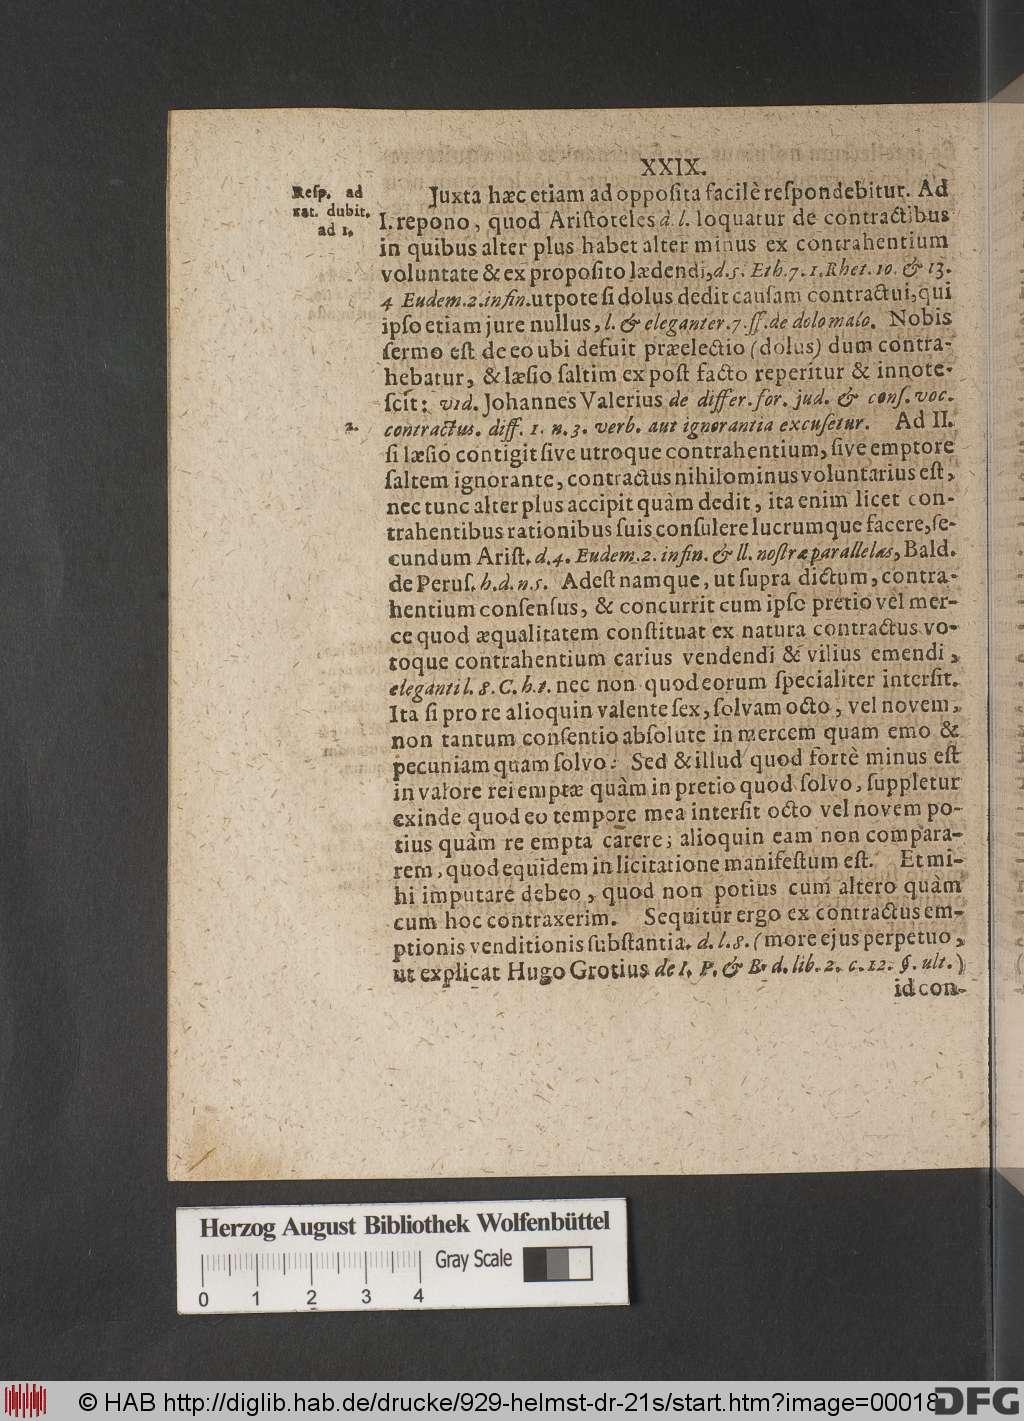 https://diglib.hab.de/drucke/929-helmst-dr-21s/00018.jpg